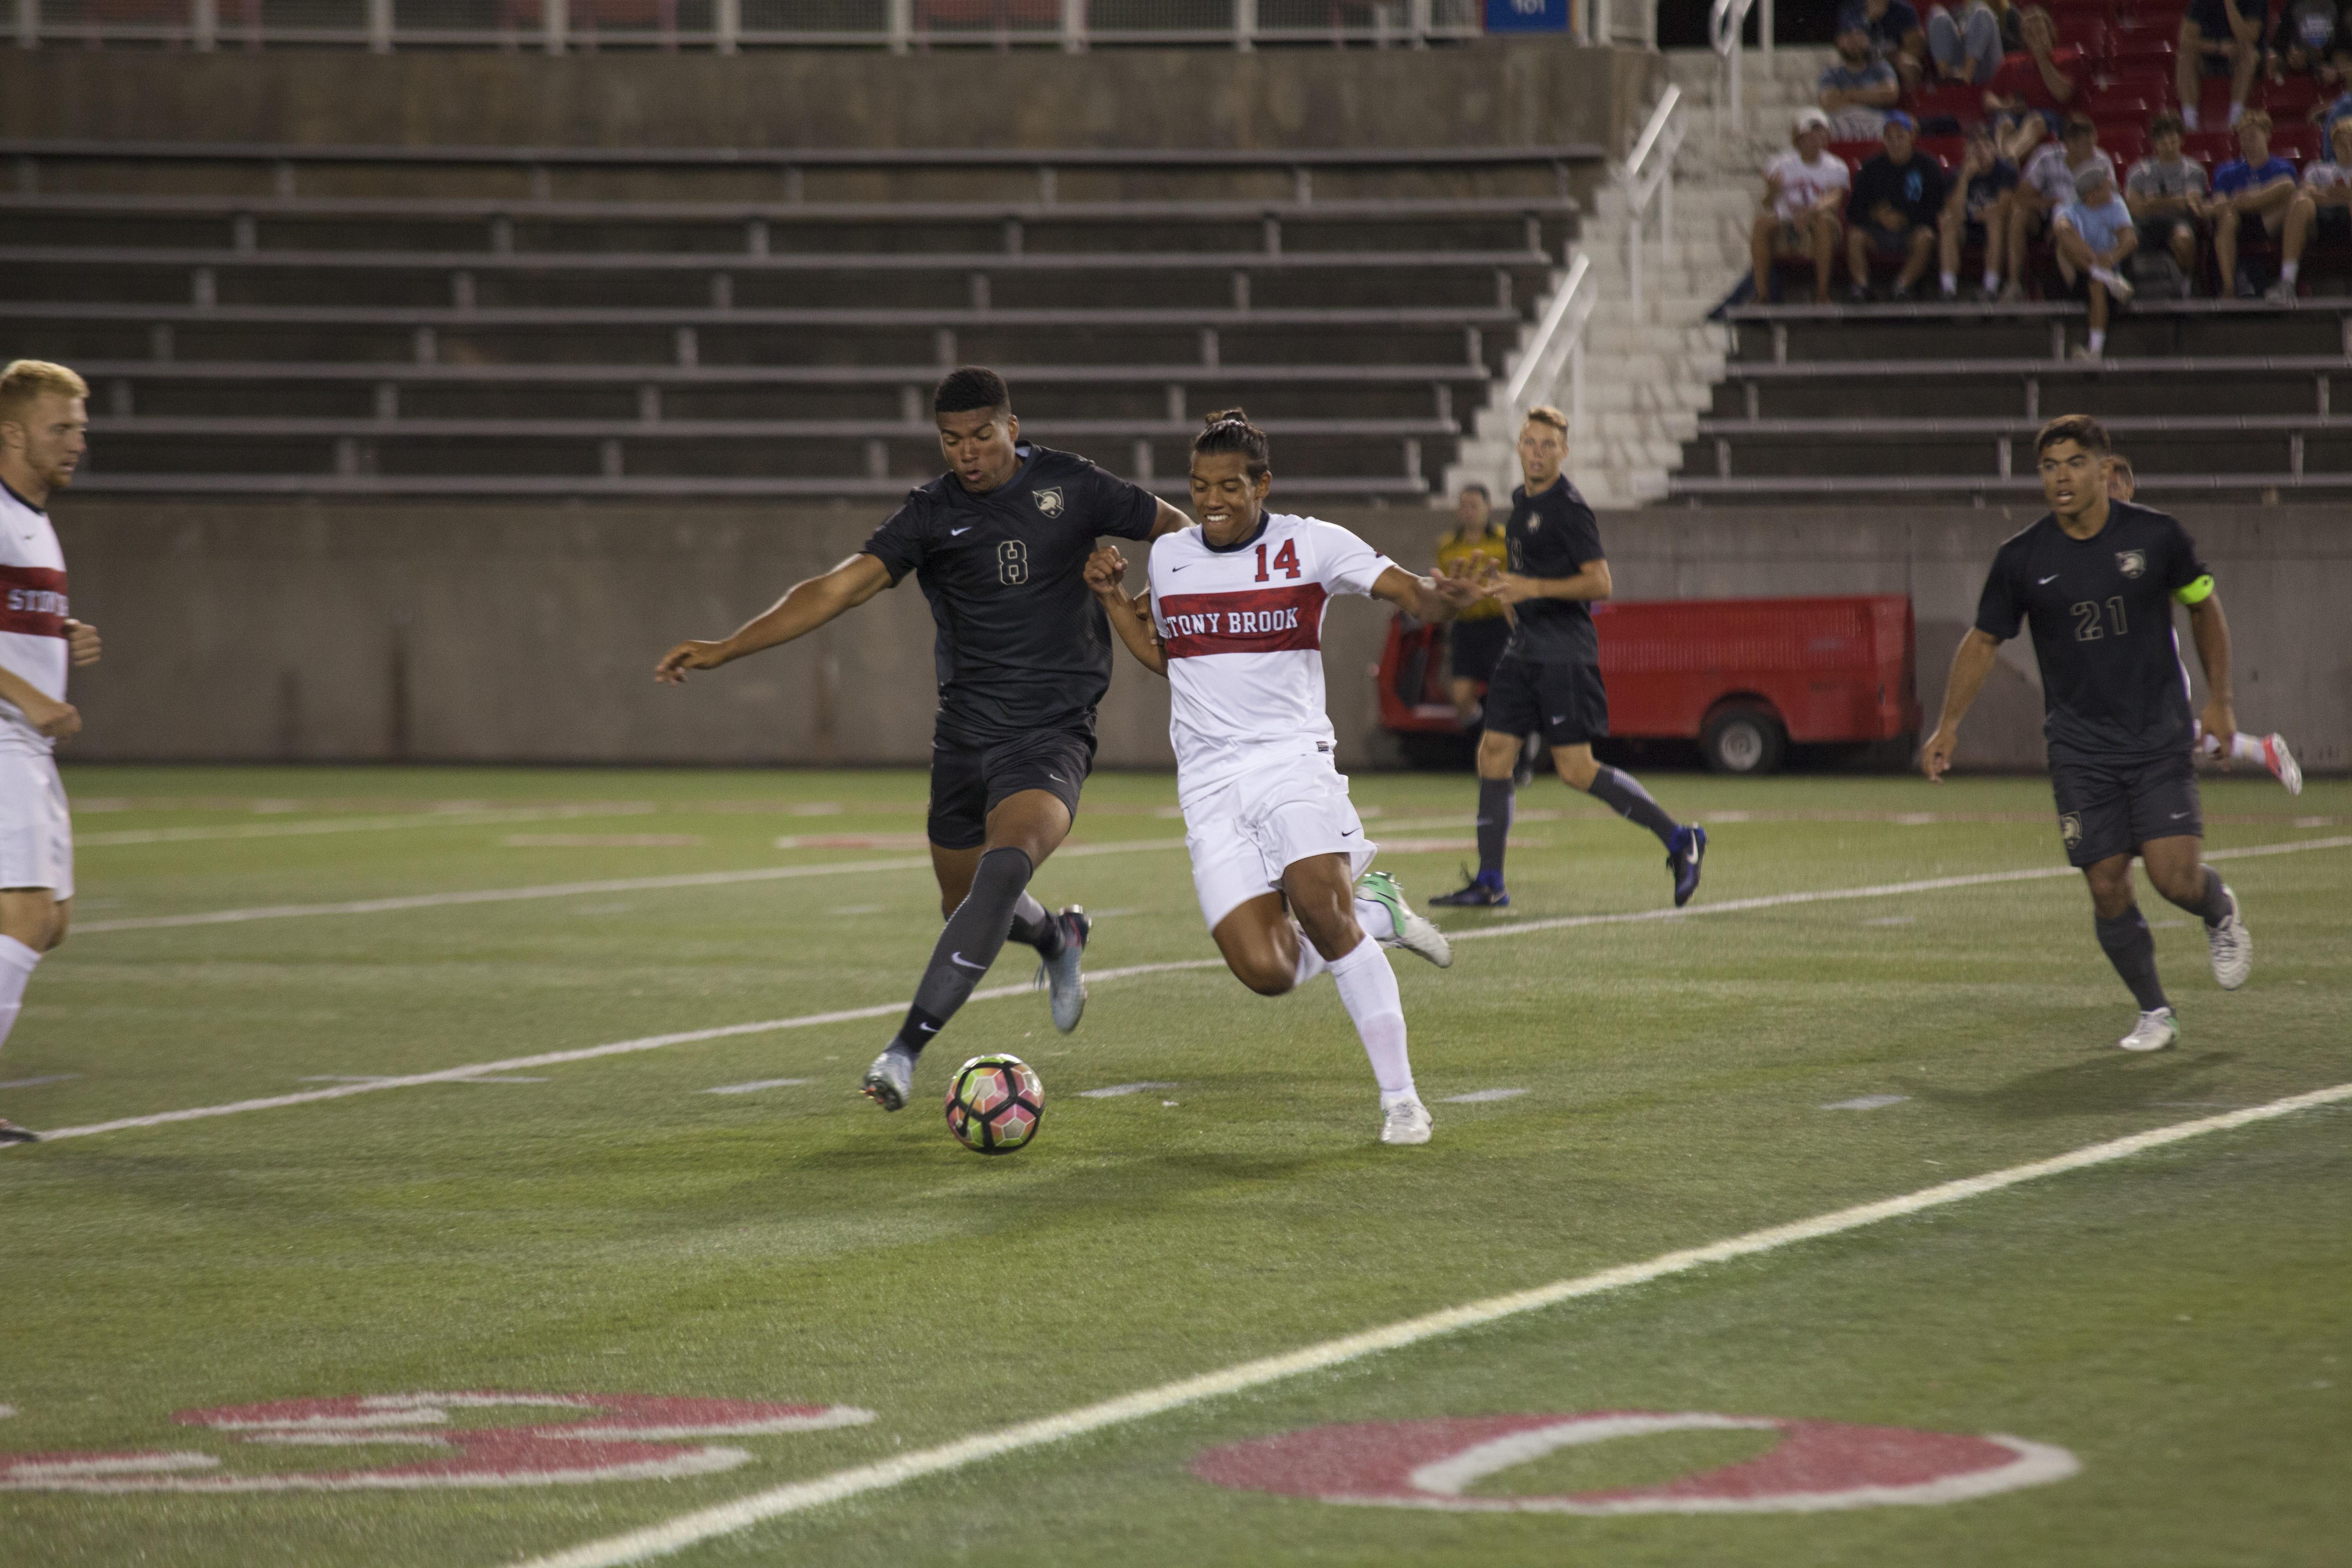 Men's Soccer Preview: Experienced Seawolves seeking America East Glory